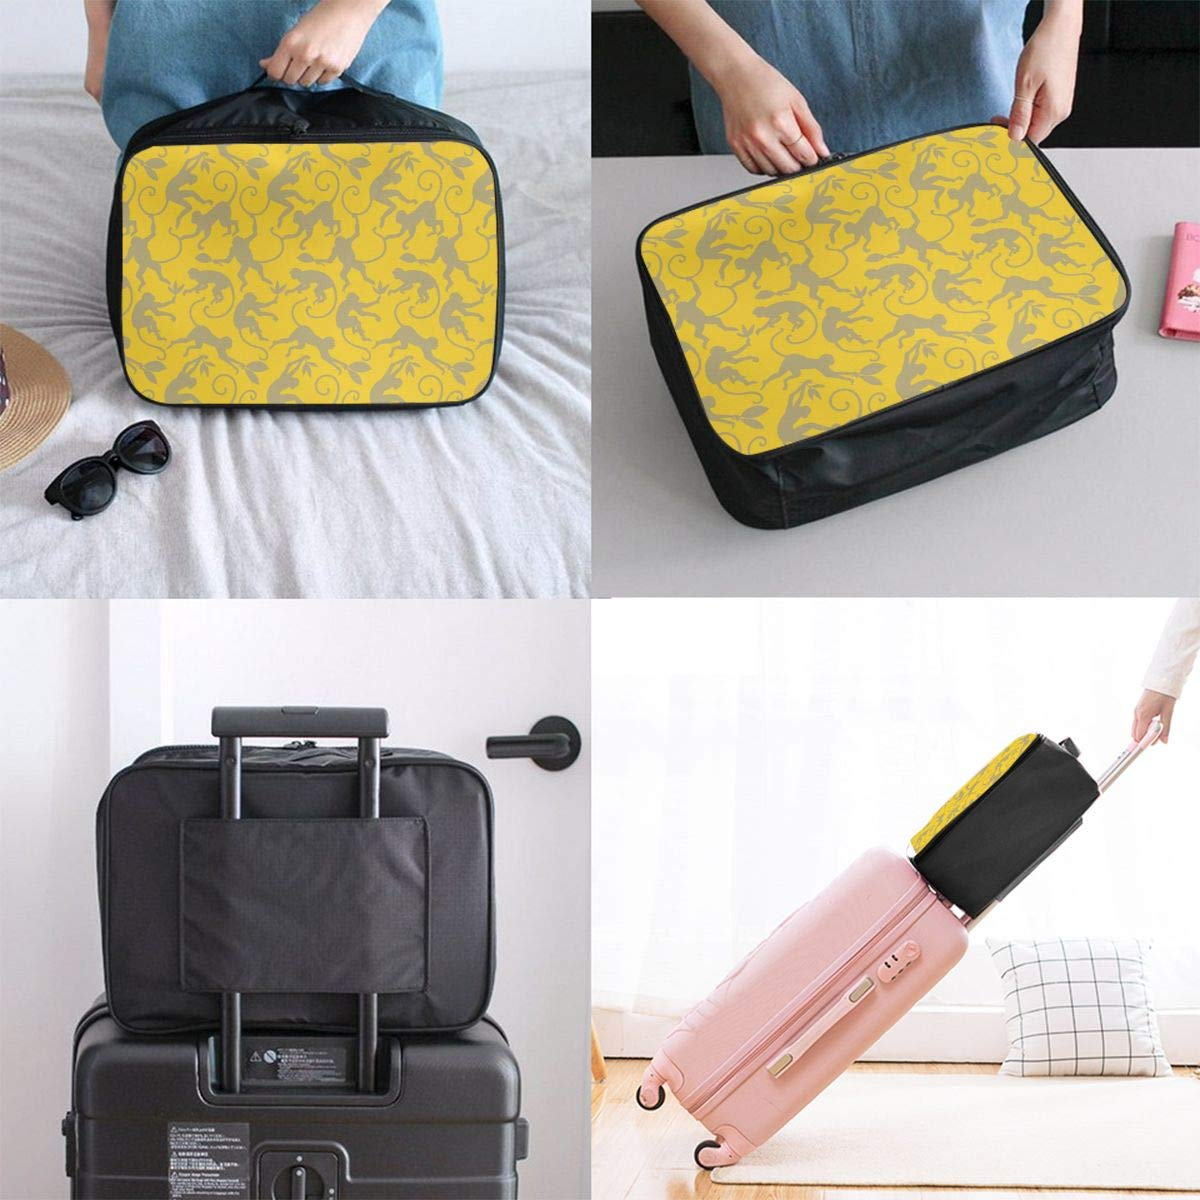 Travel Luggage Duffle Bag Lightweight Portable Handbag Monkey Yellow Painting Large Capacity Waterproof Foldable Storage Tote